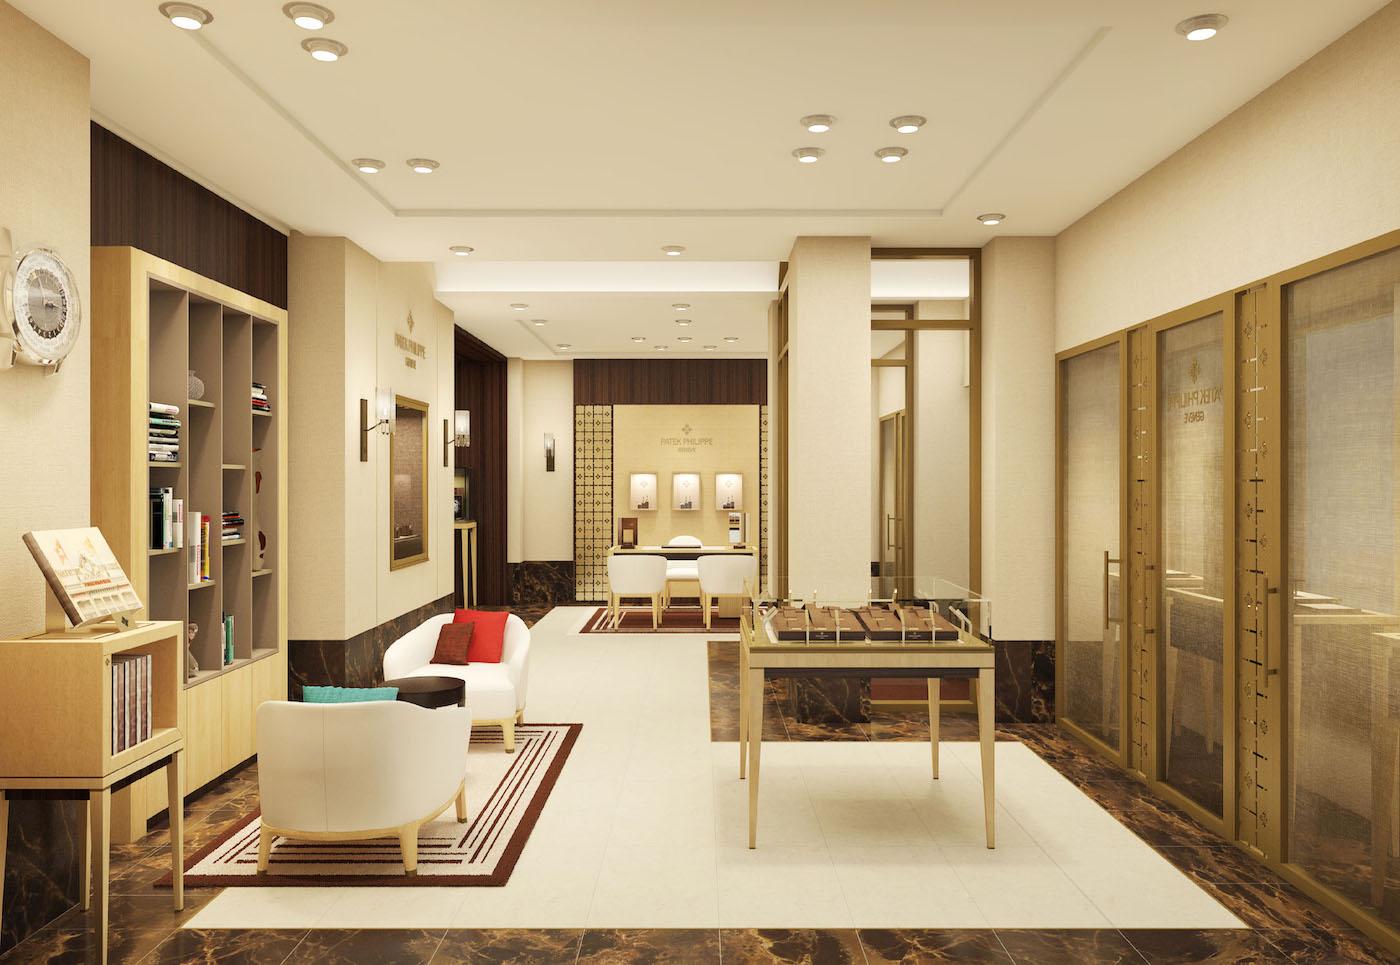 Tiny Jewel Box unveils expanded Patek Philippe showroom